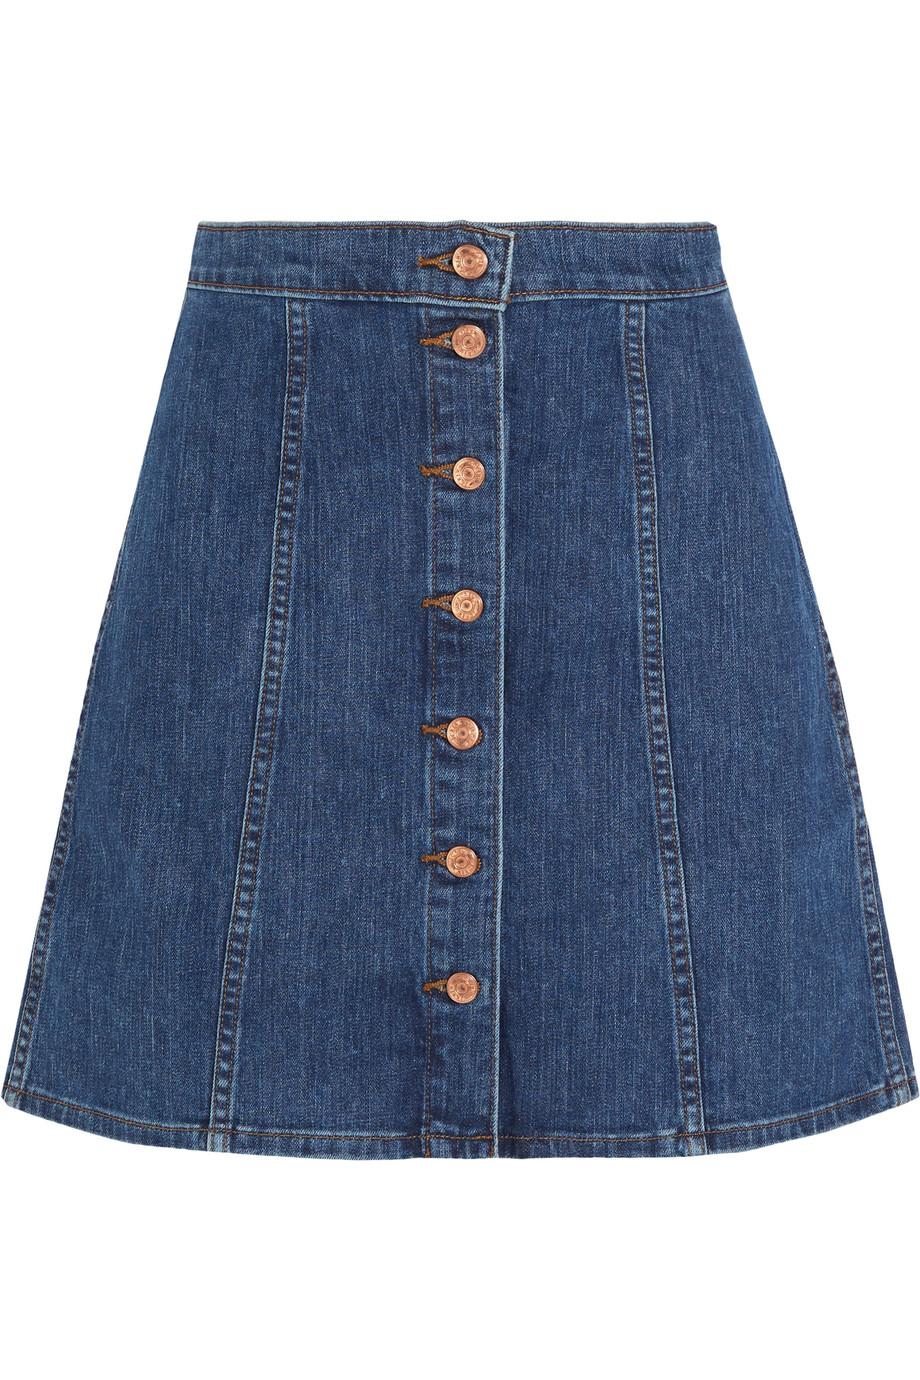 J.Crew Stretch-Denim Mini Skirt, Blue, Women's, Size: 24